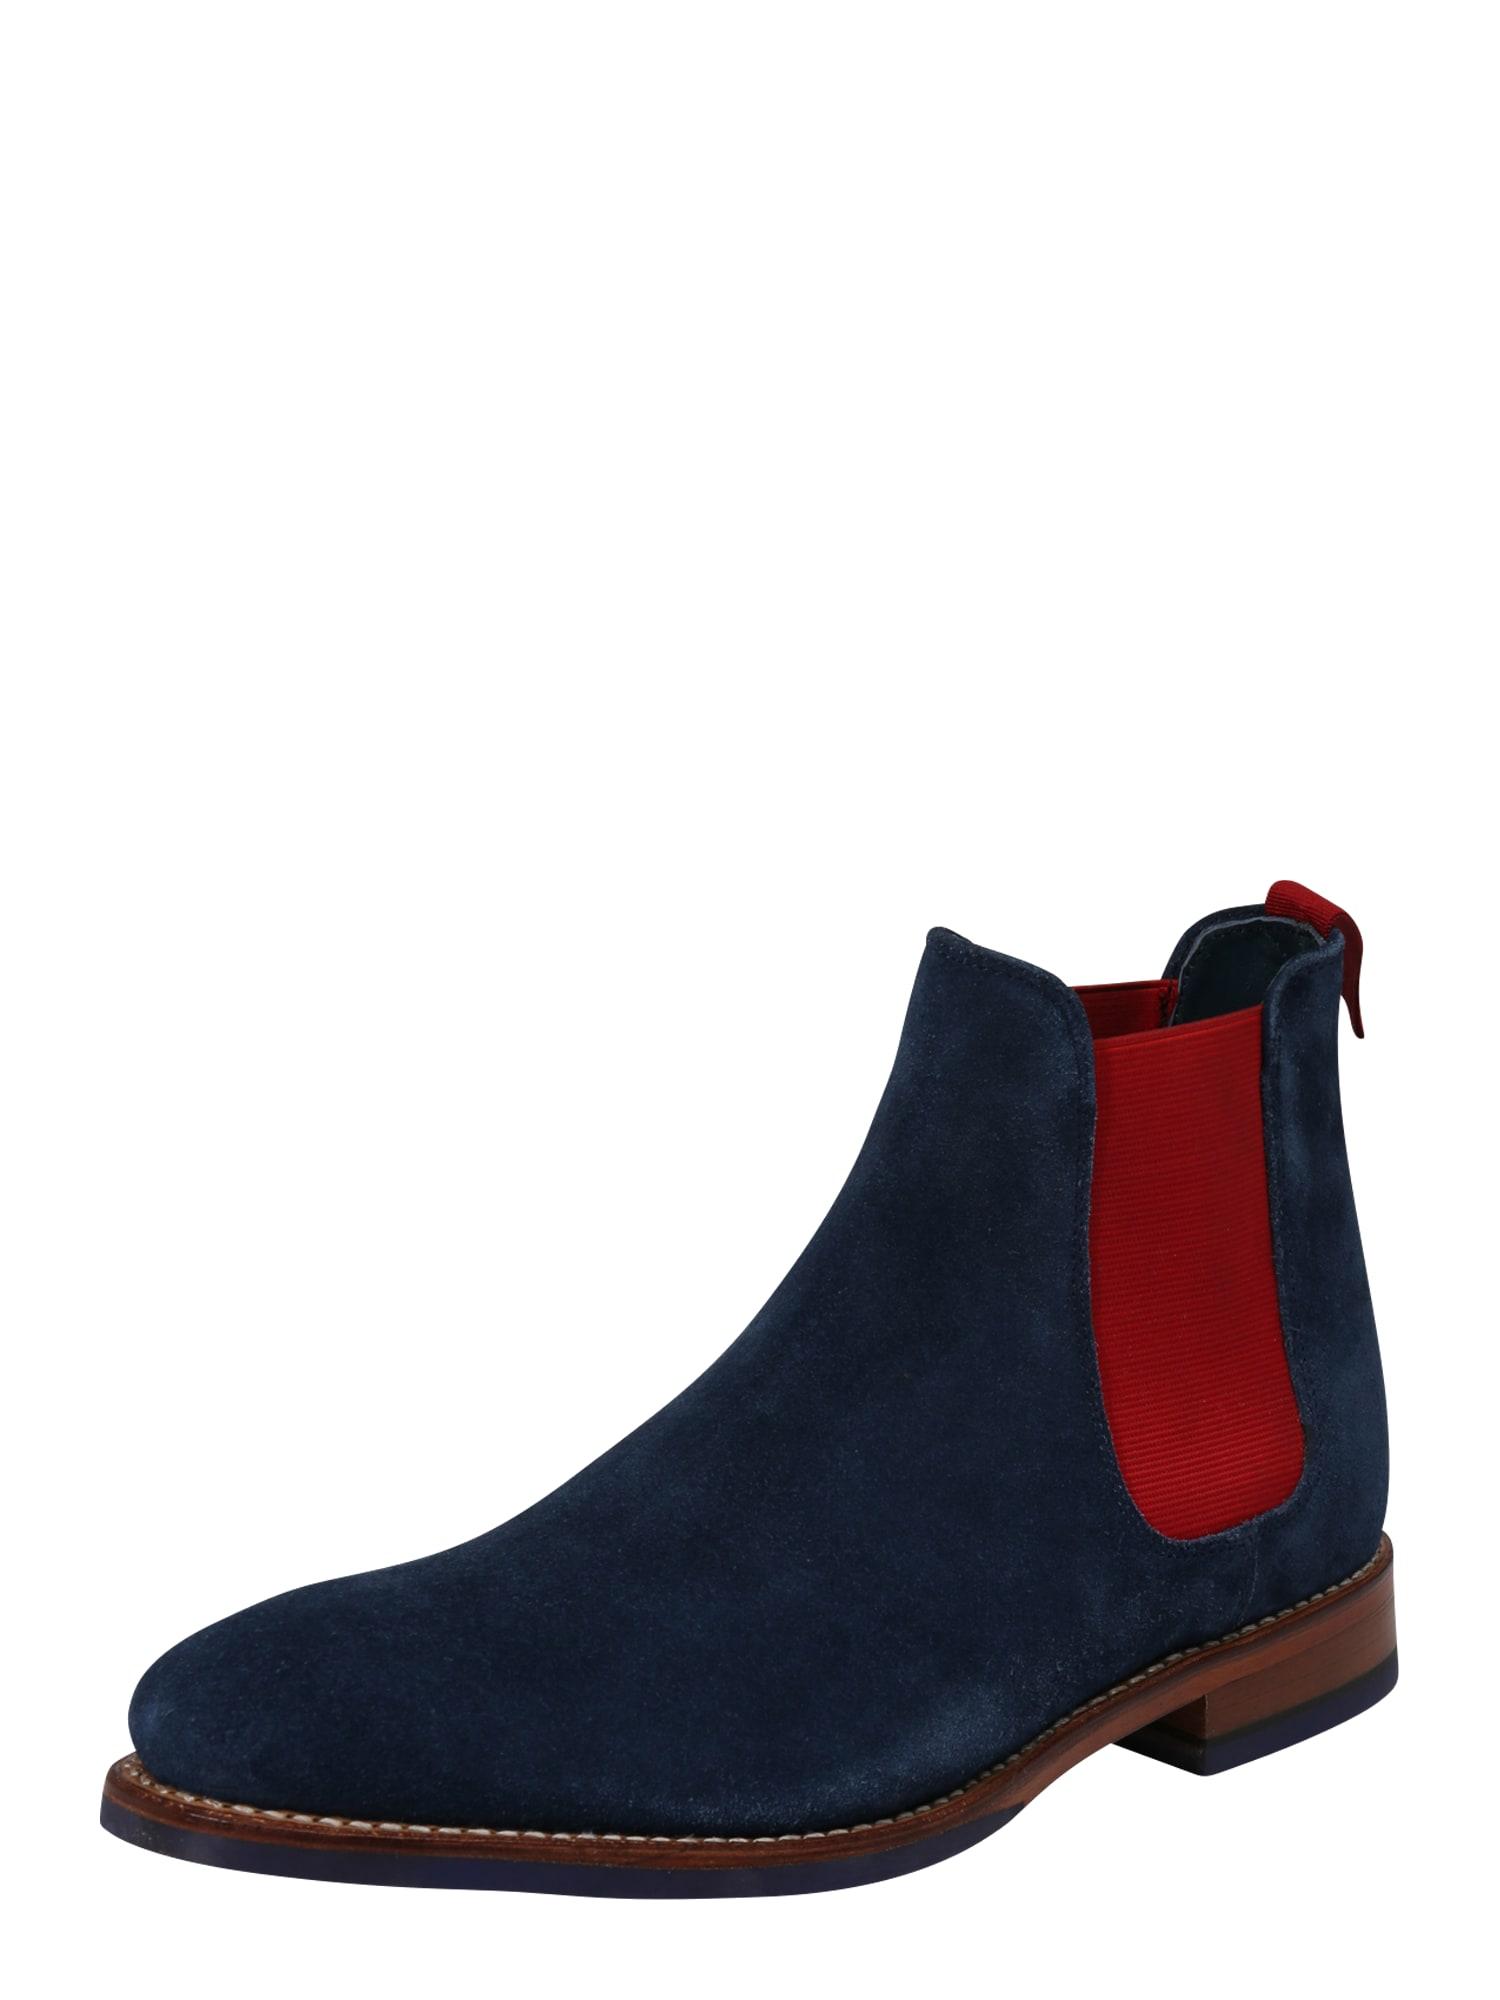 Chelsea boty BOJAN námořnická modř červená Gordon & Bros